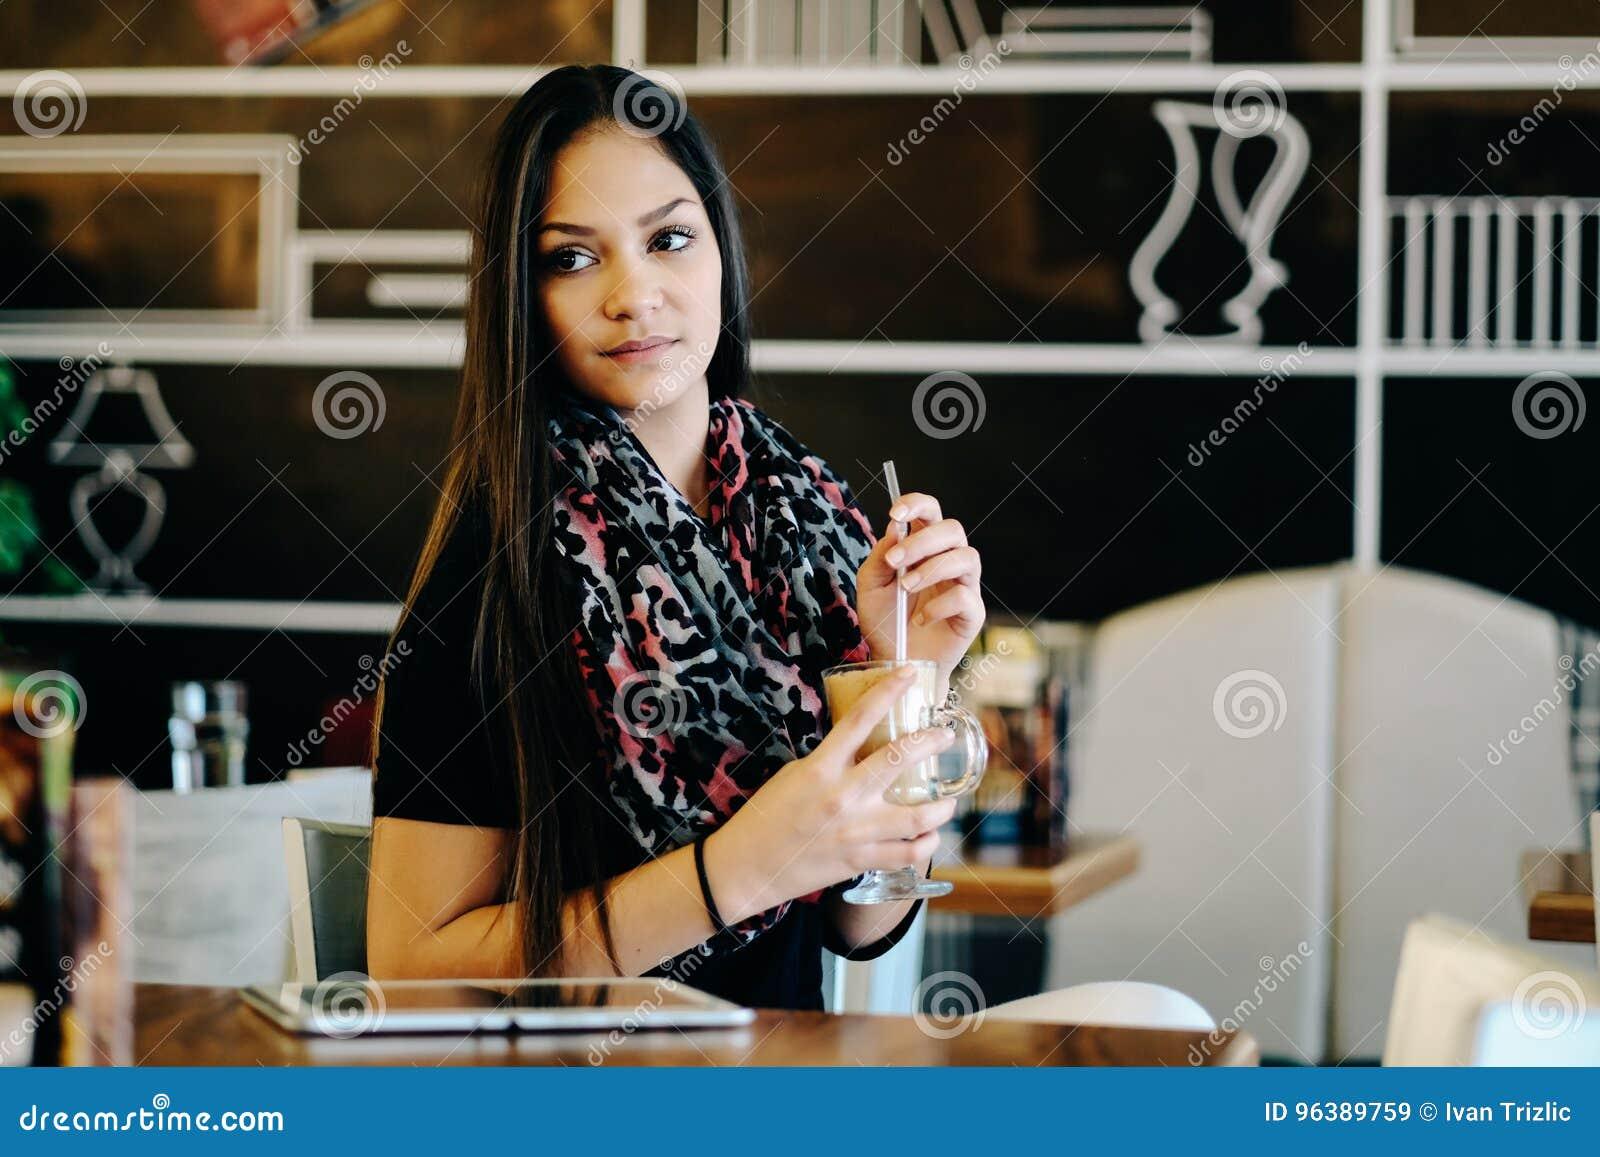 Beautiful girl drinking ice mocha shake in a cafe